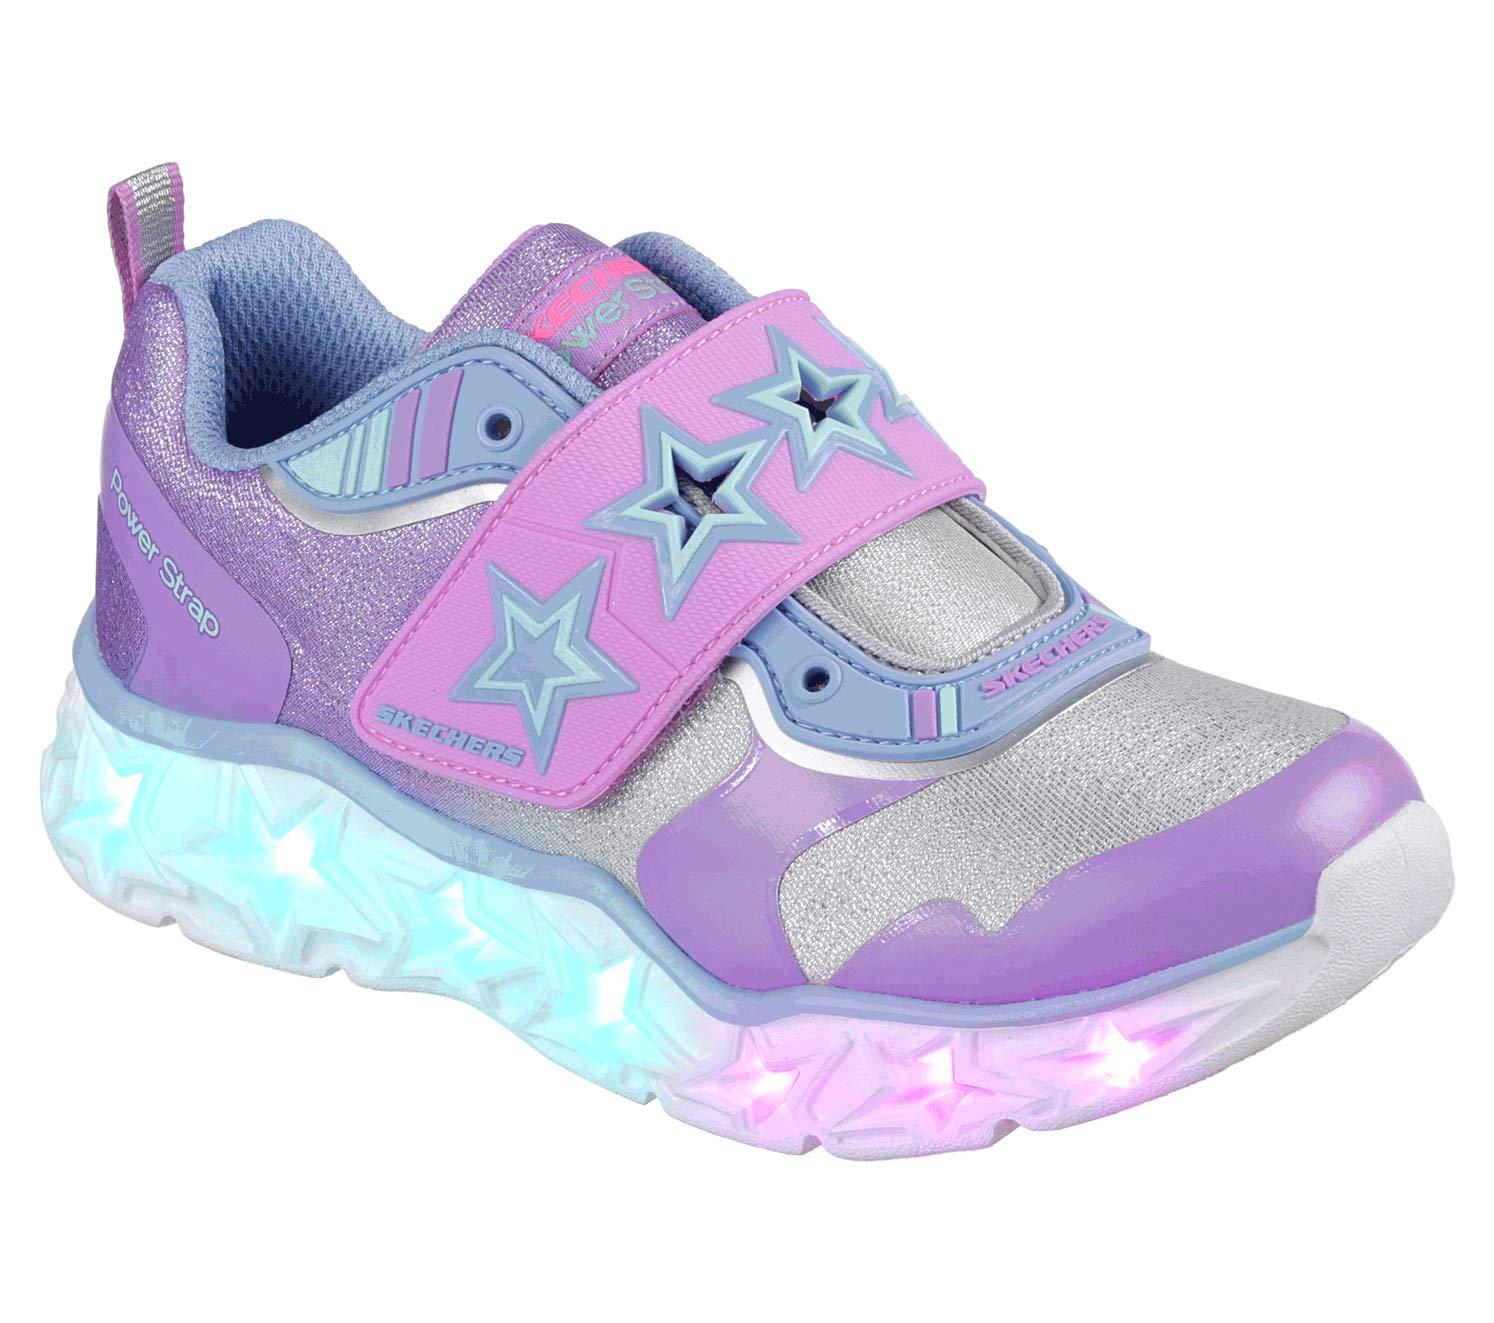 ویکالا · خرید  اصل اورجینال · خرید از آمازون · Skechers Kids Girls' Galaxy Lights-Cosmic Kick Sneaker, Silver/Lavender, 4 Medium US Big Kid wekala · ویکالا